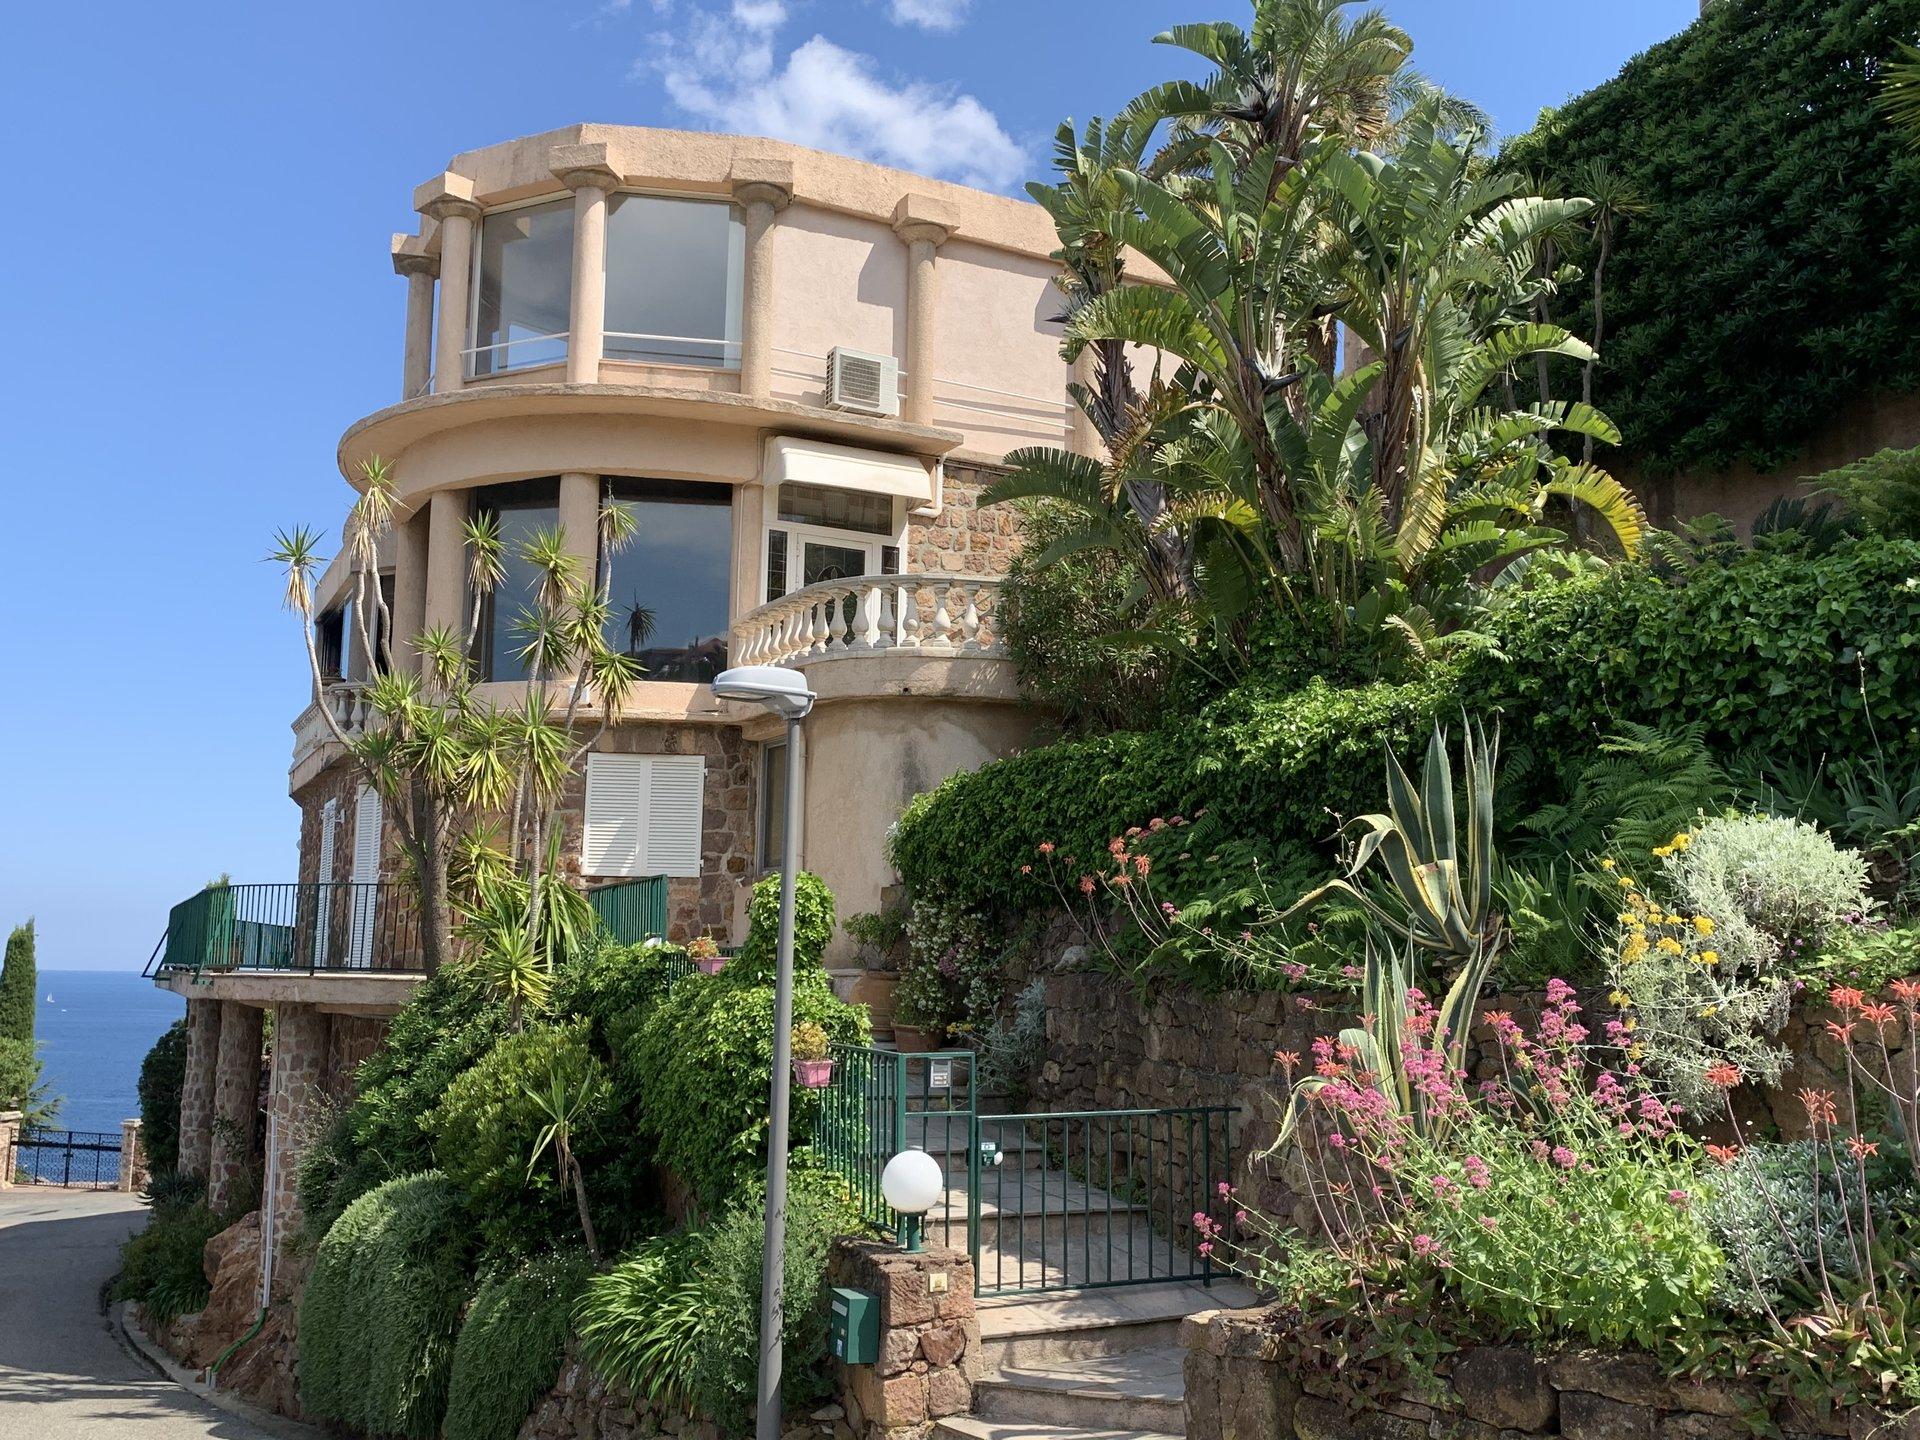 Продажа Квартира - Теуль-сюр-Мер (Théoule-sur-Mer)